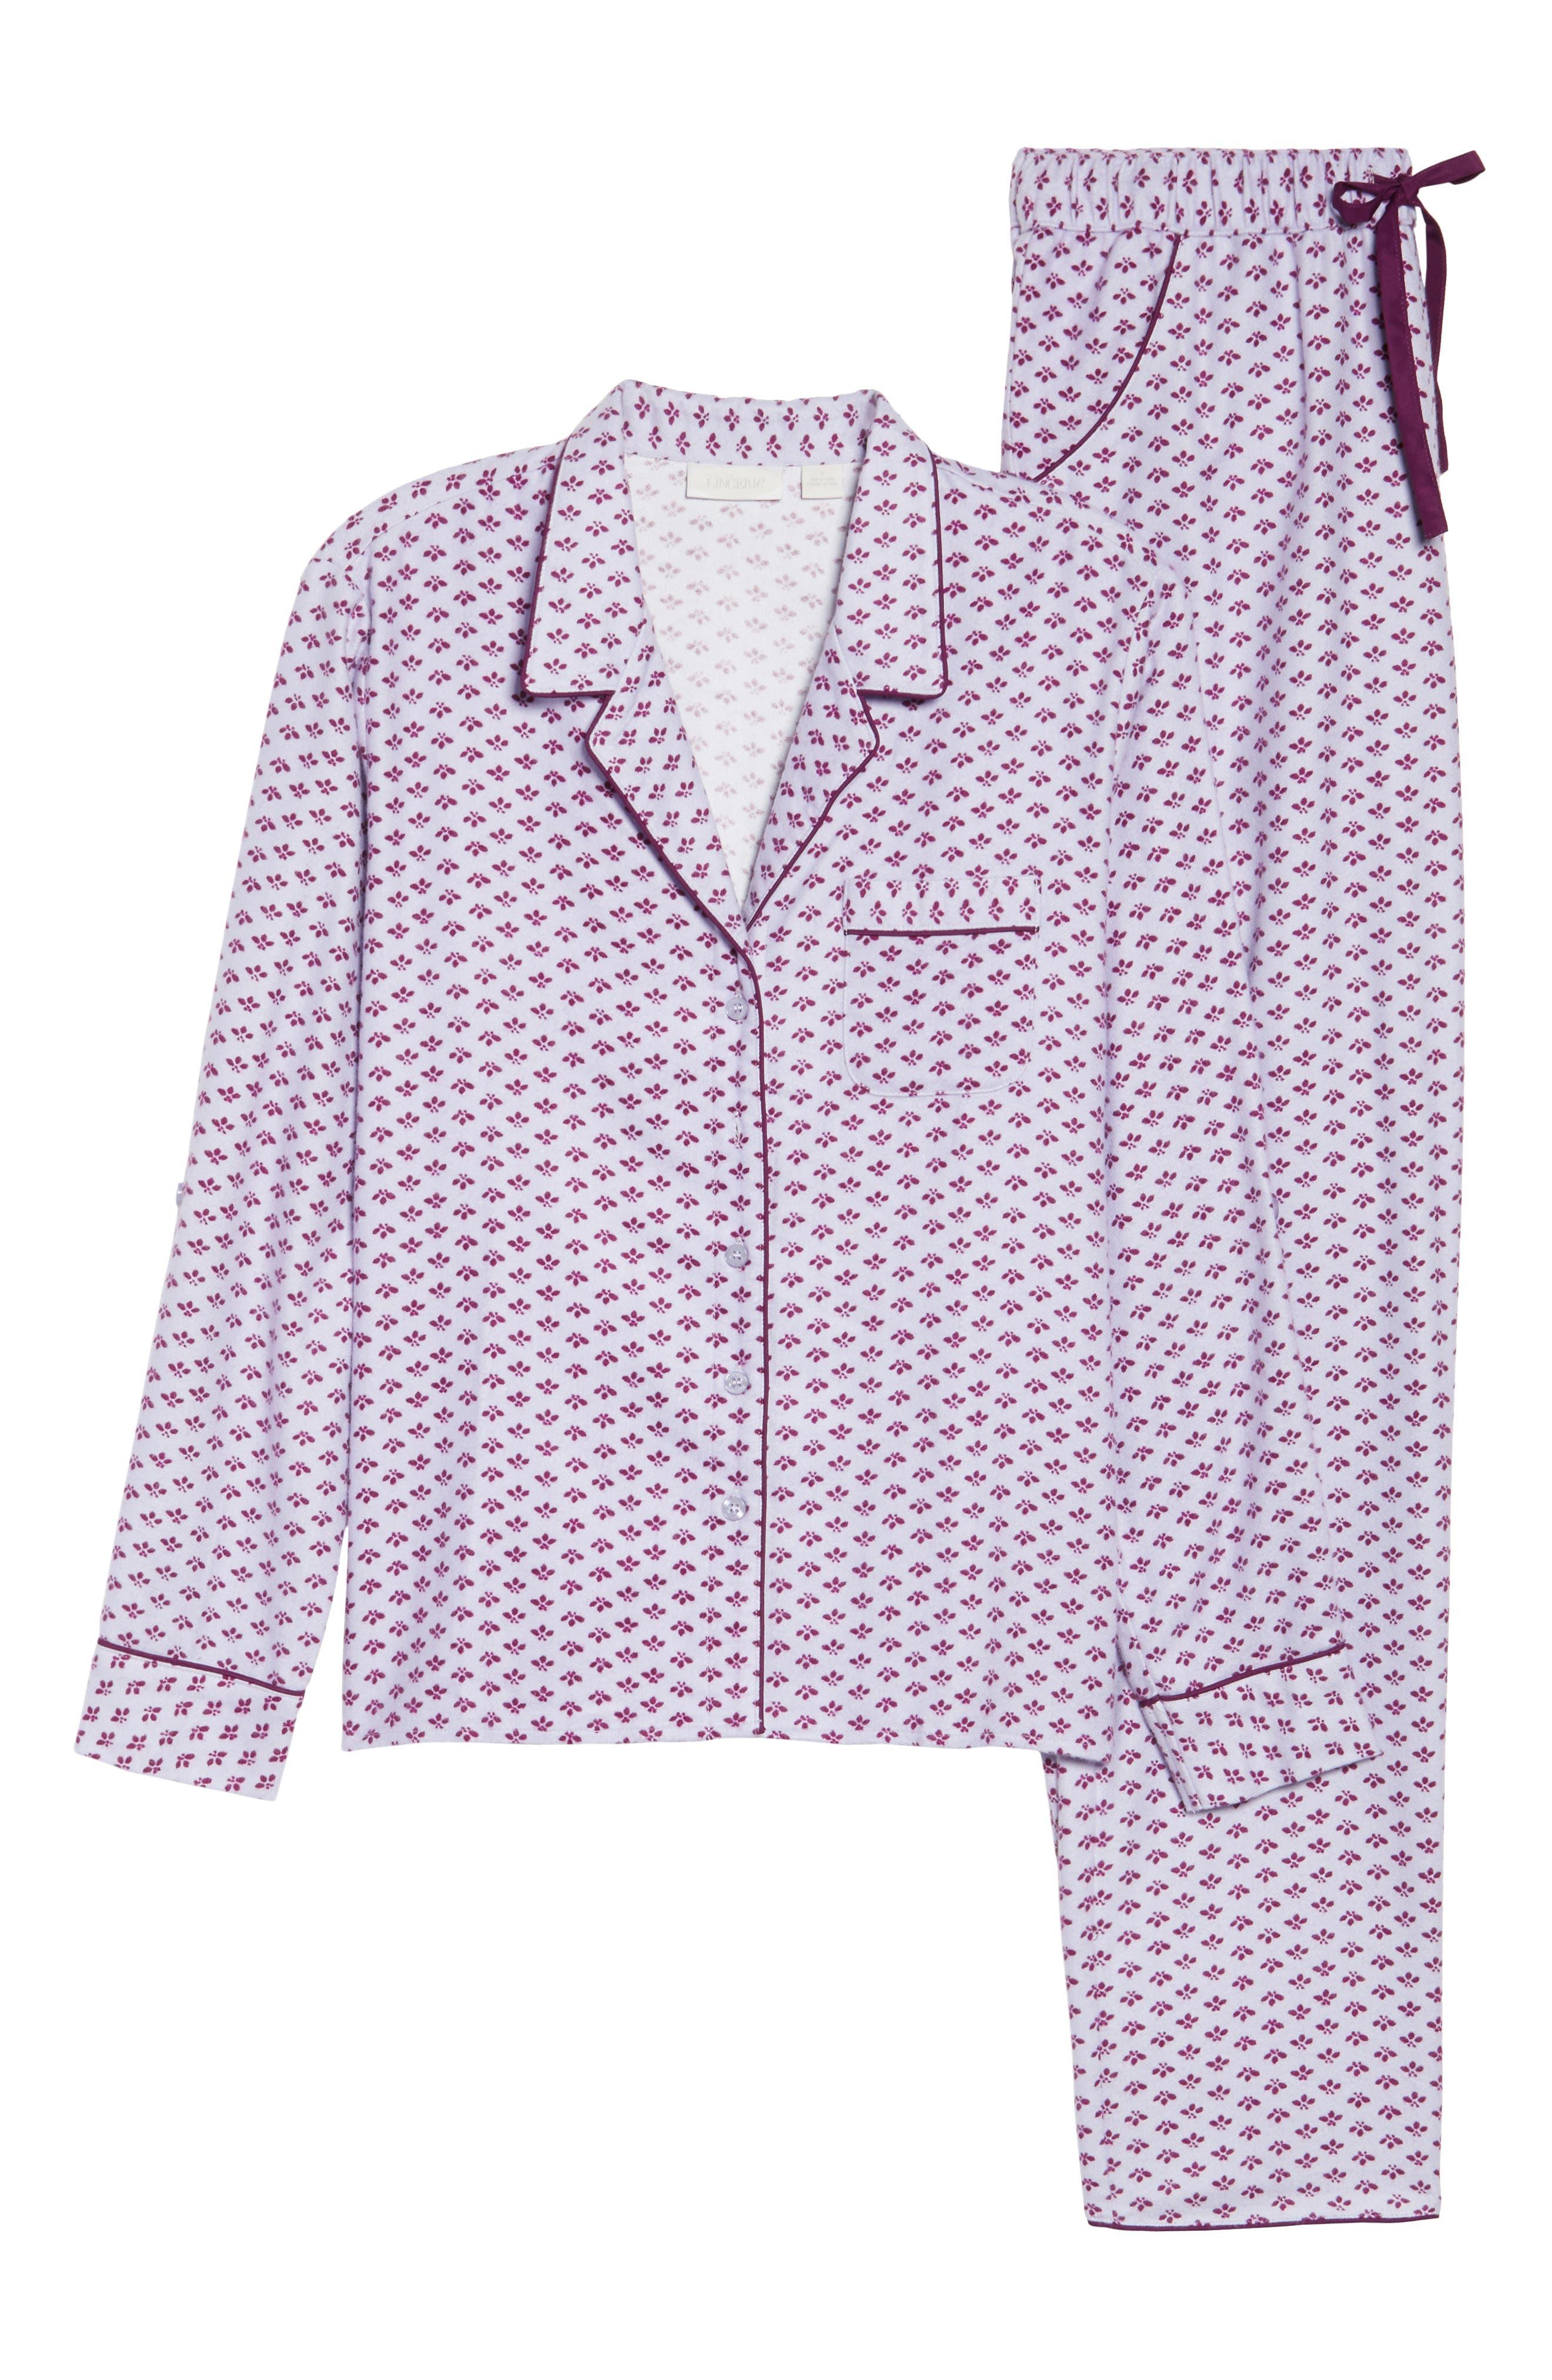 Lingerie Starlight Flannel Pajamas,                             Alternate thumbnail 29, color,